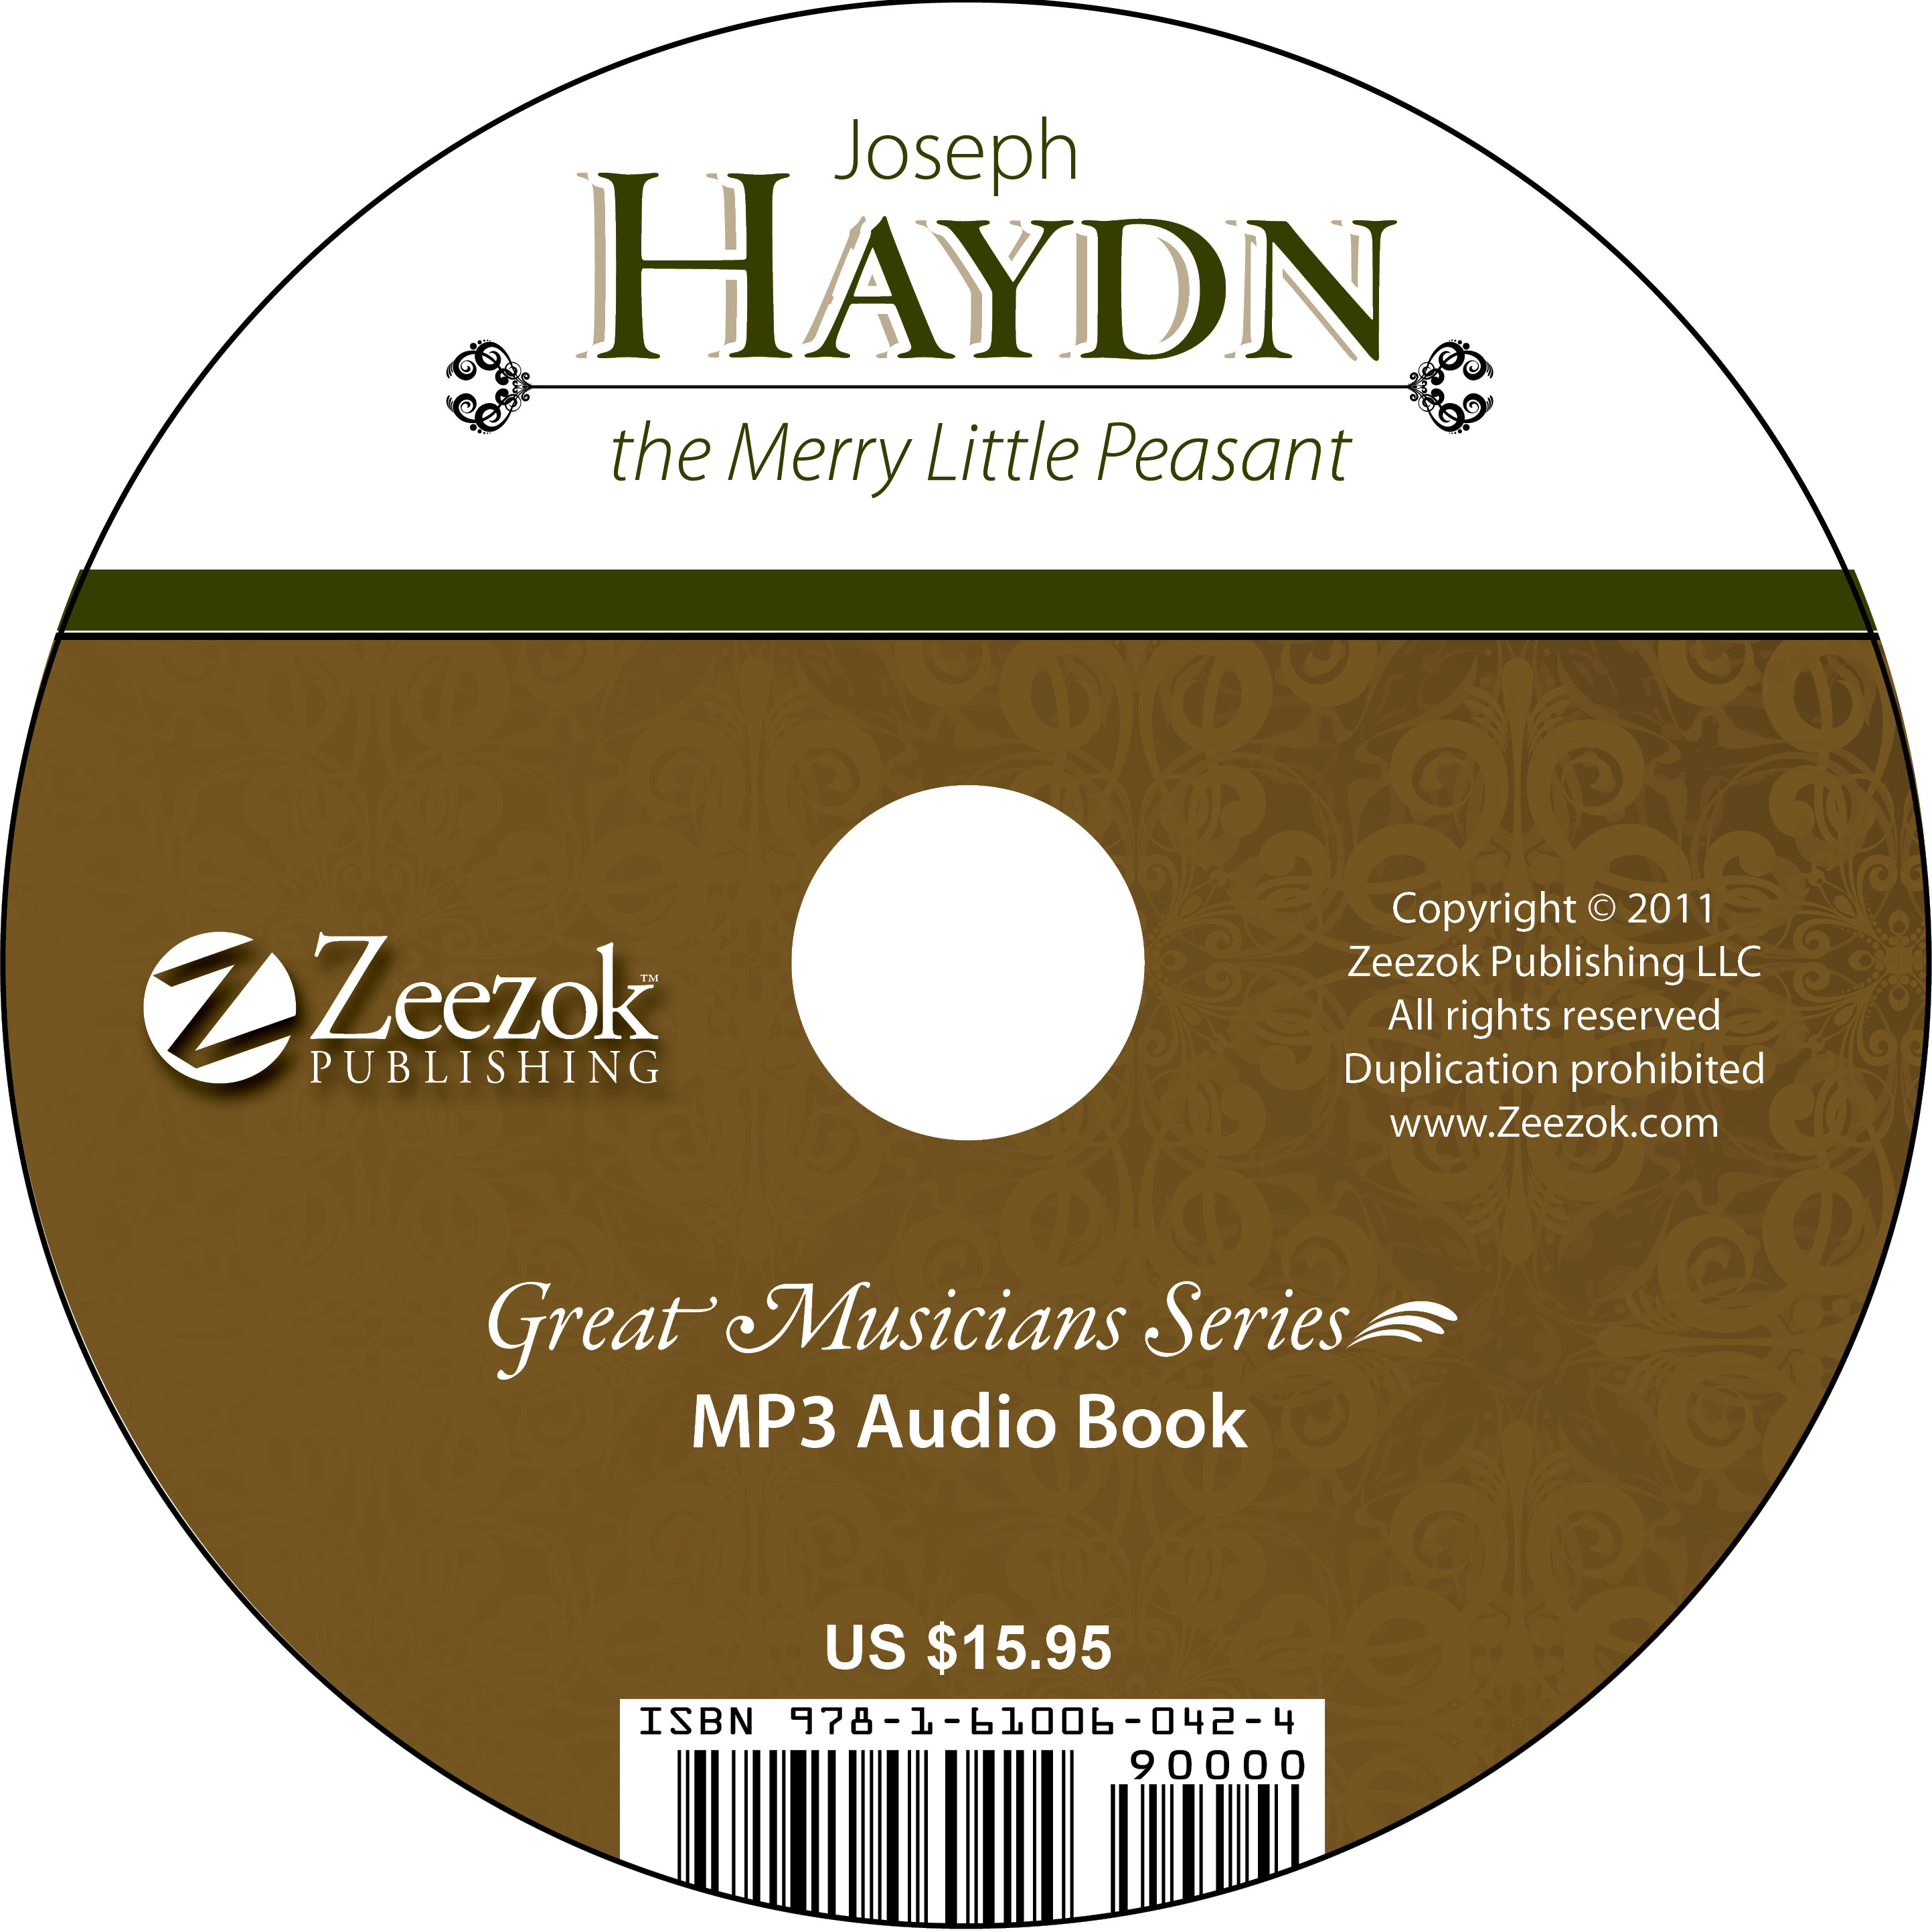 Joseph Haydn, The Merry Little Peasant Audio Book on CD ... - photo#40